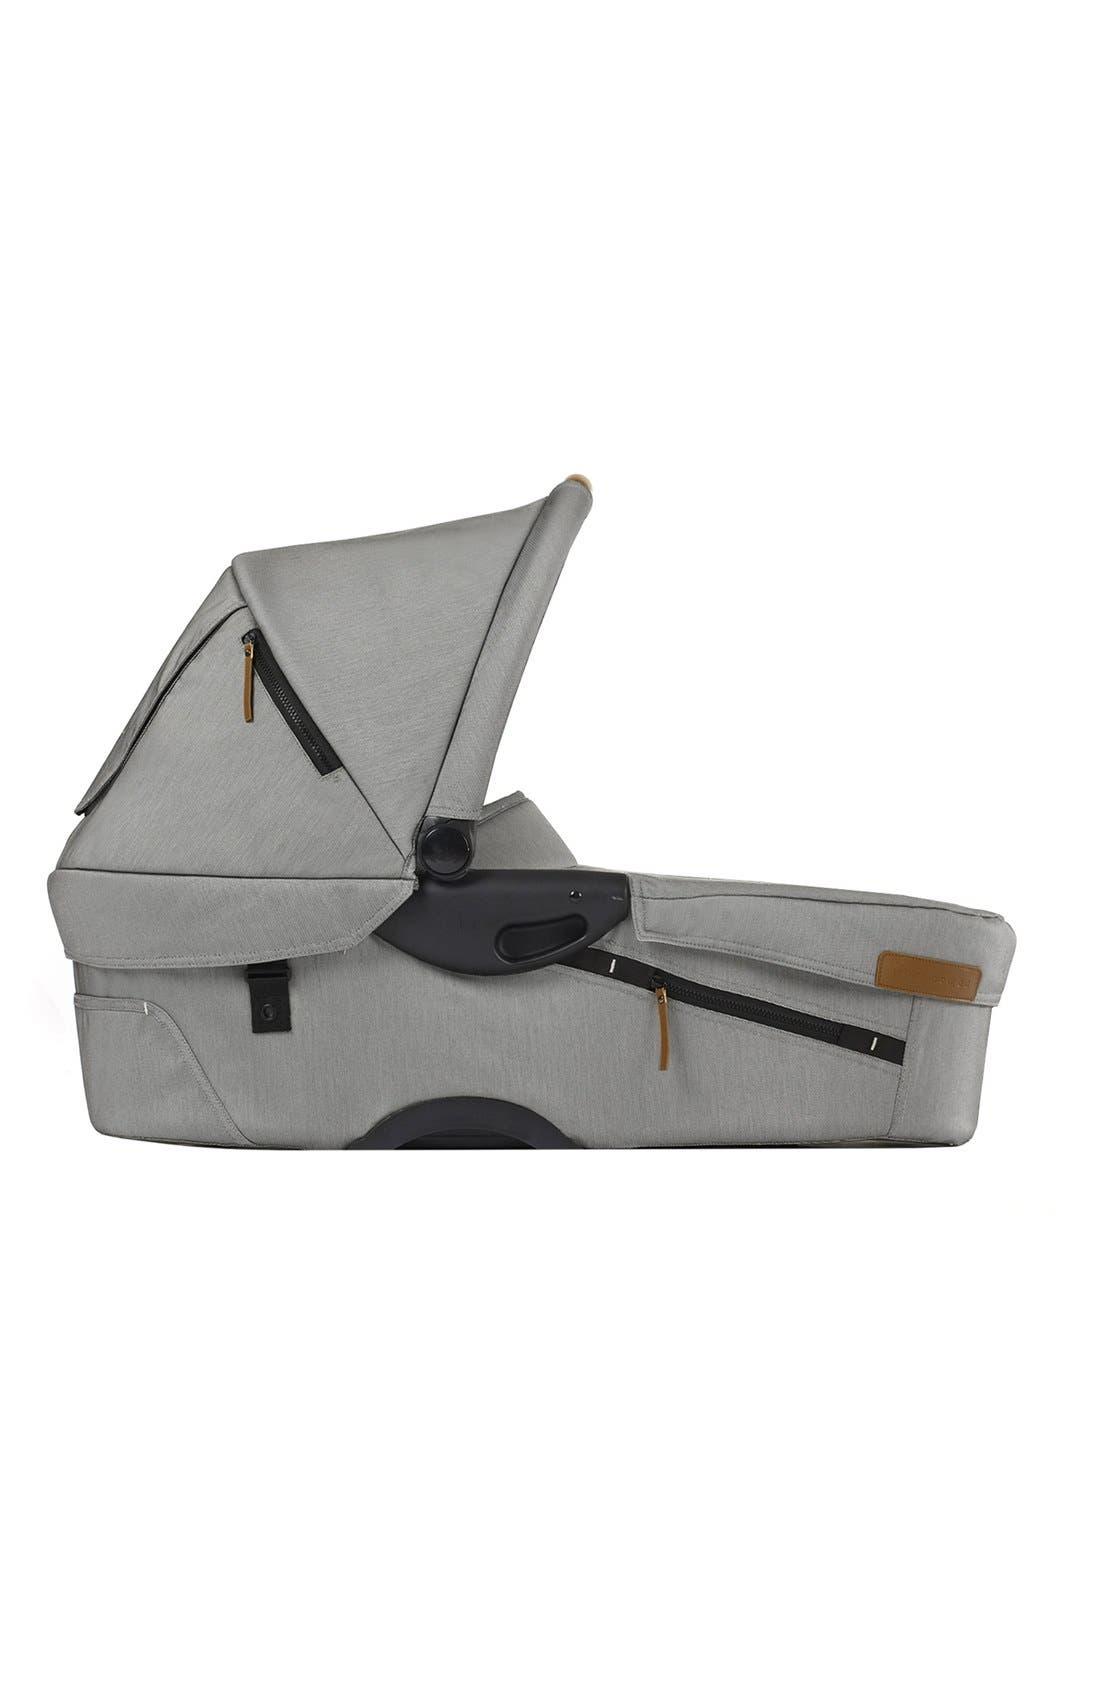 'Evo - Urban Nomad' Bassinet,                         Main,                         color, Light Grey